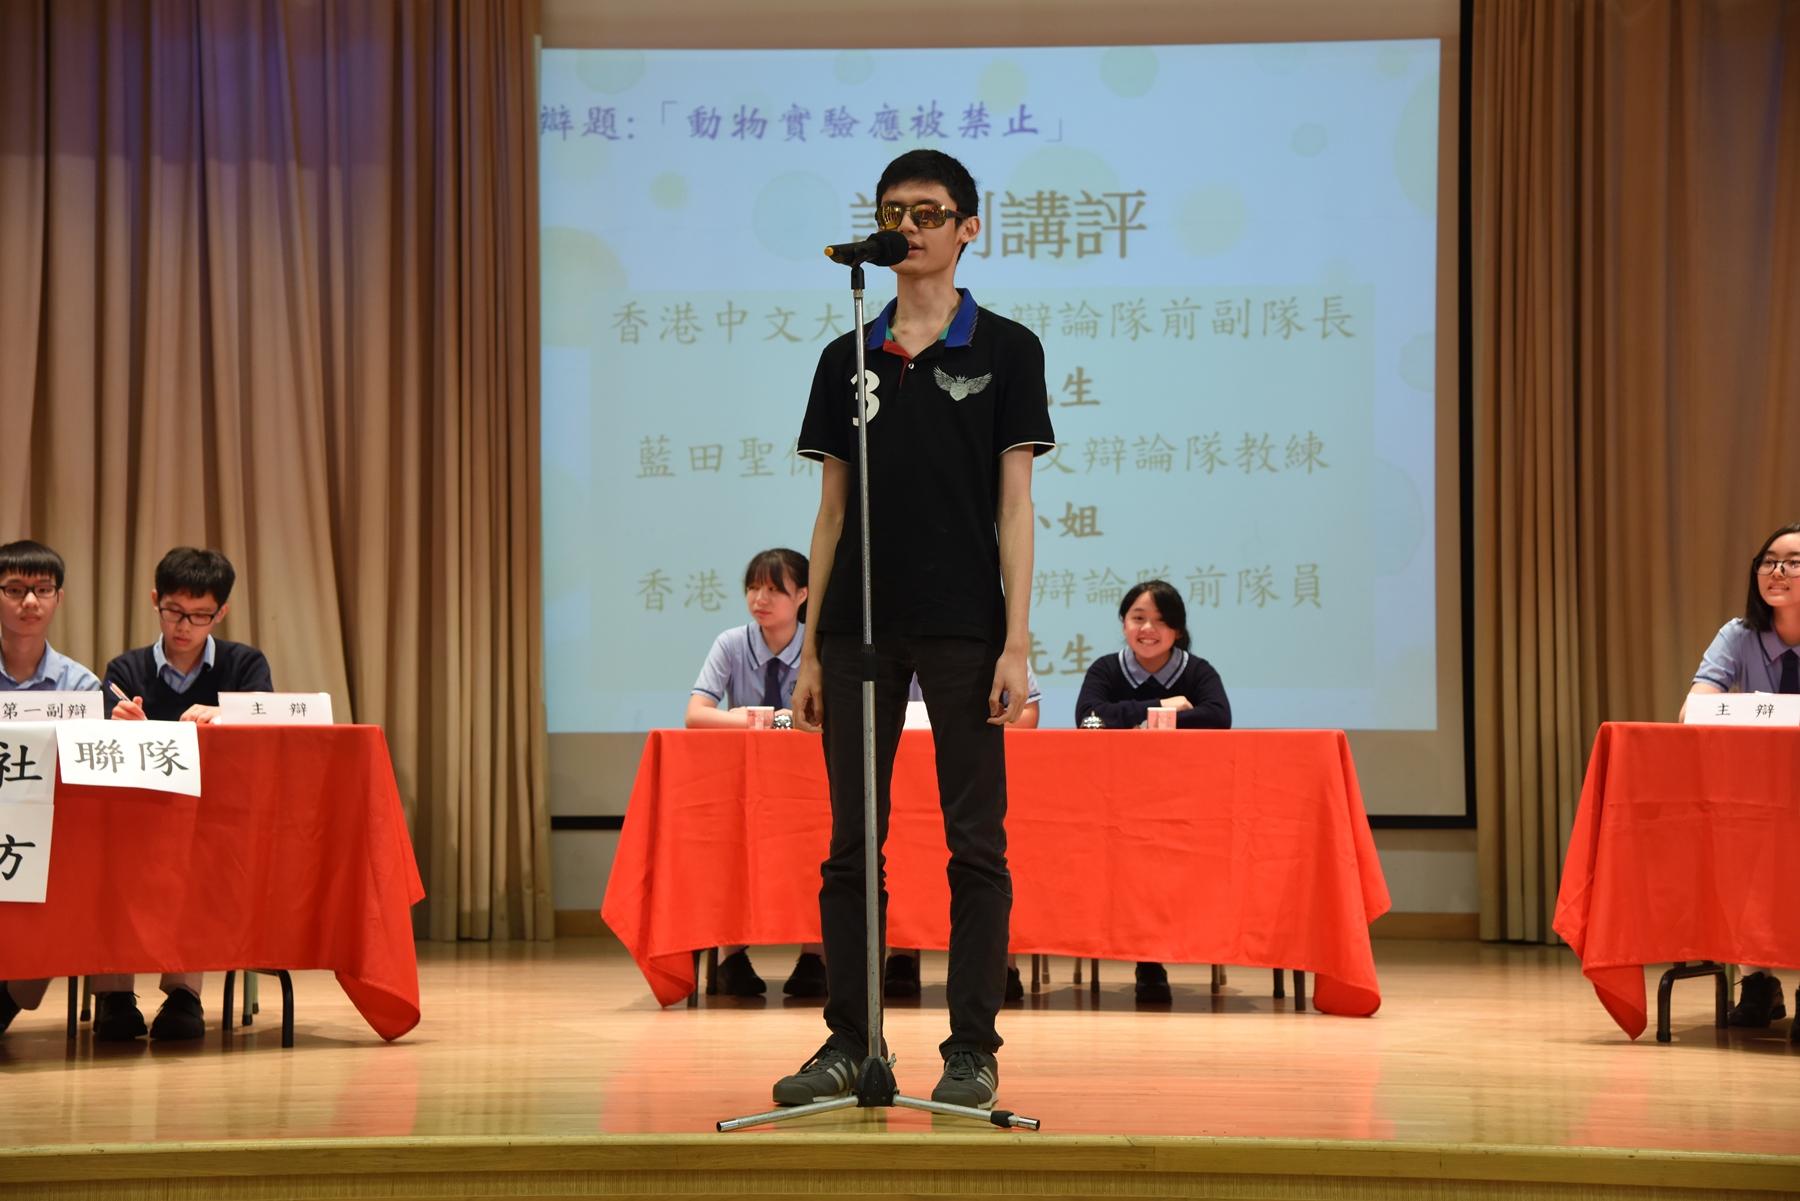 http://npc.edu.hk/sites/default/files/dsc_3740.jpg